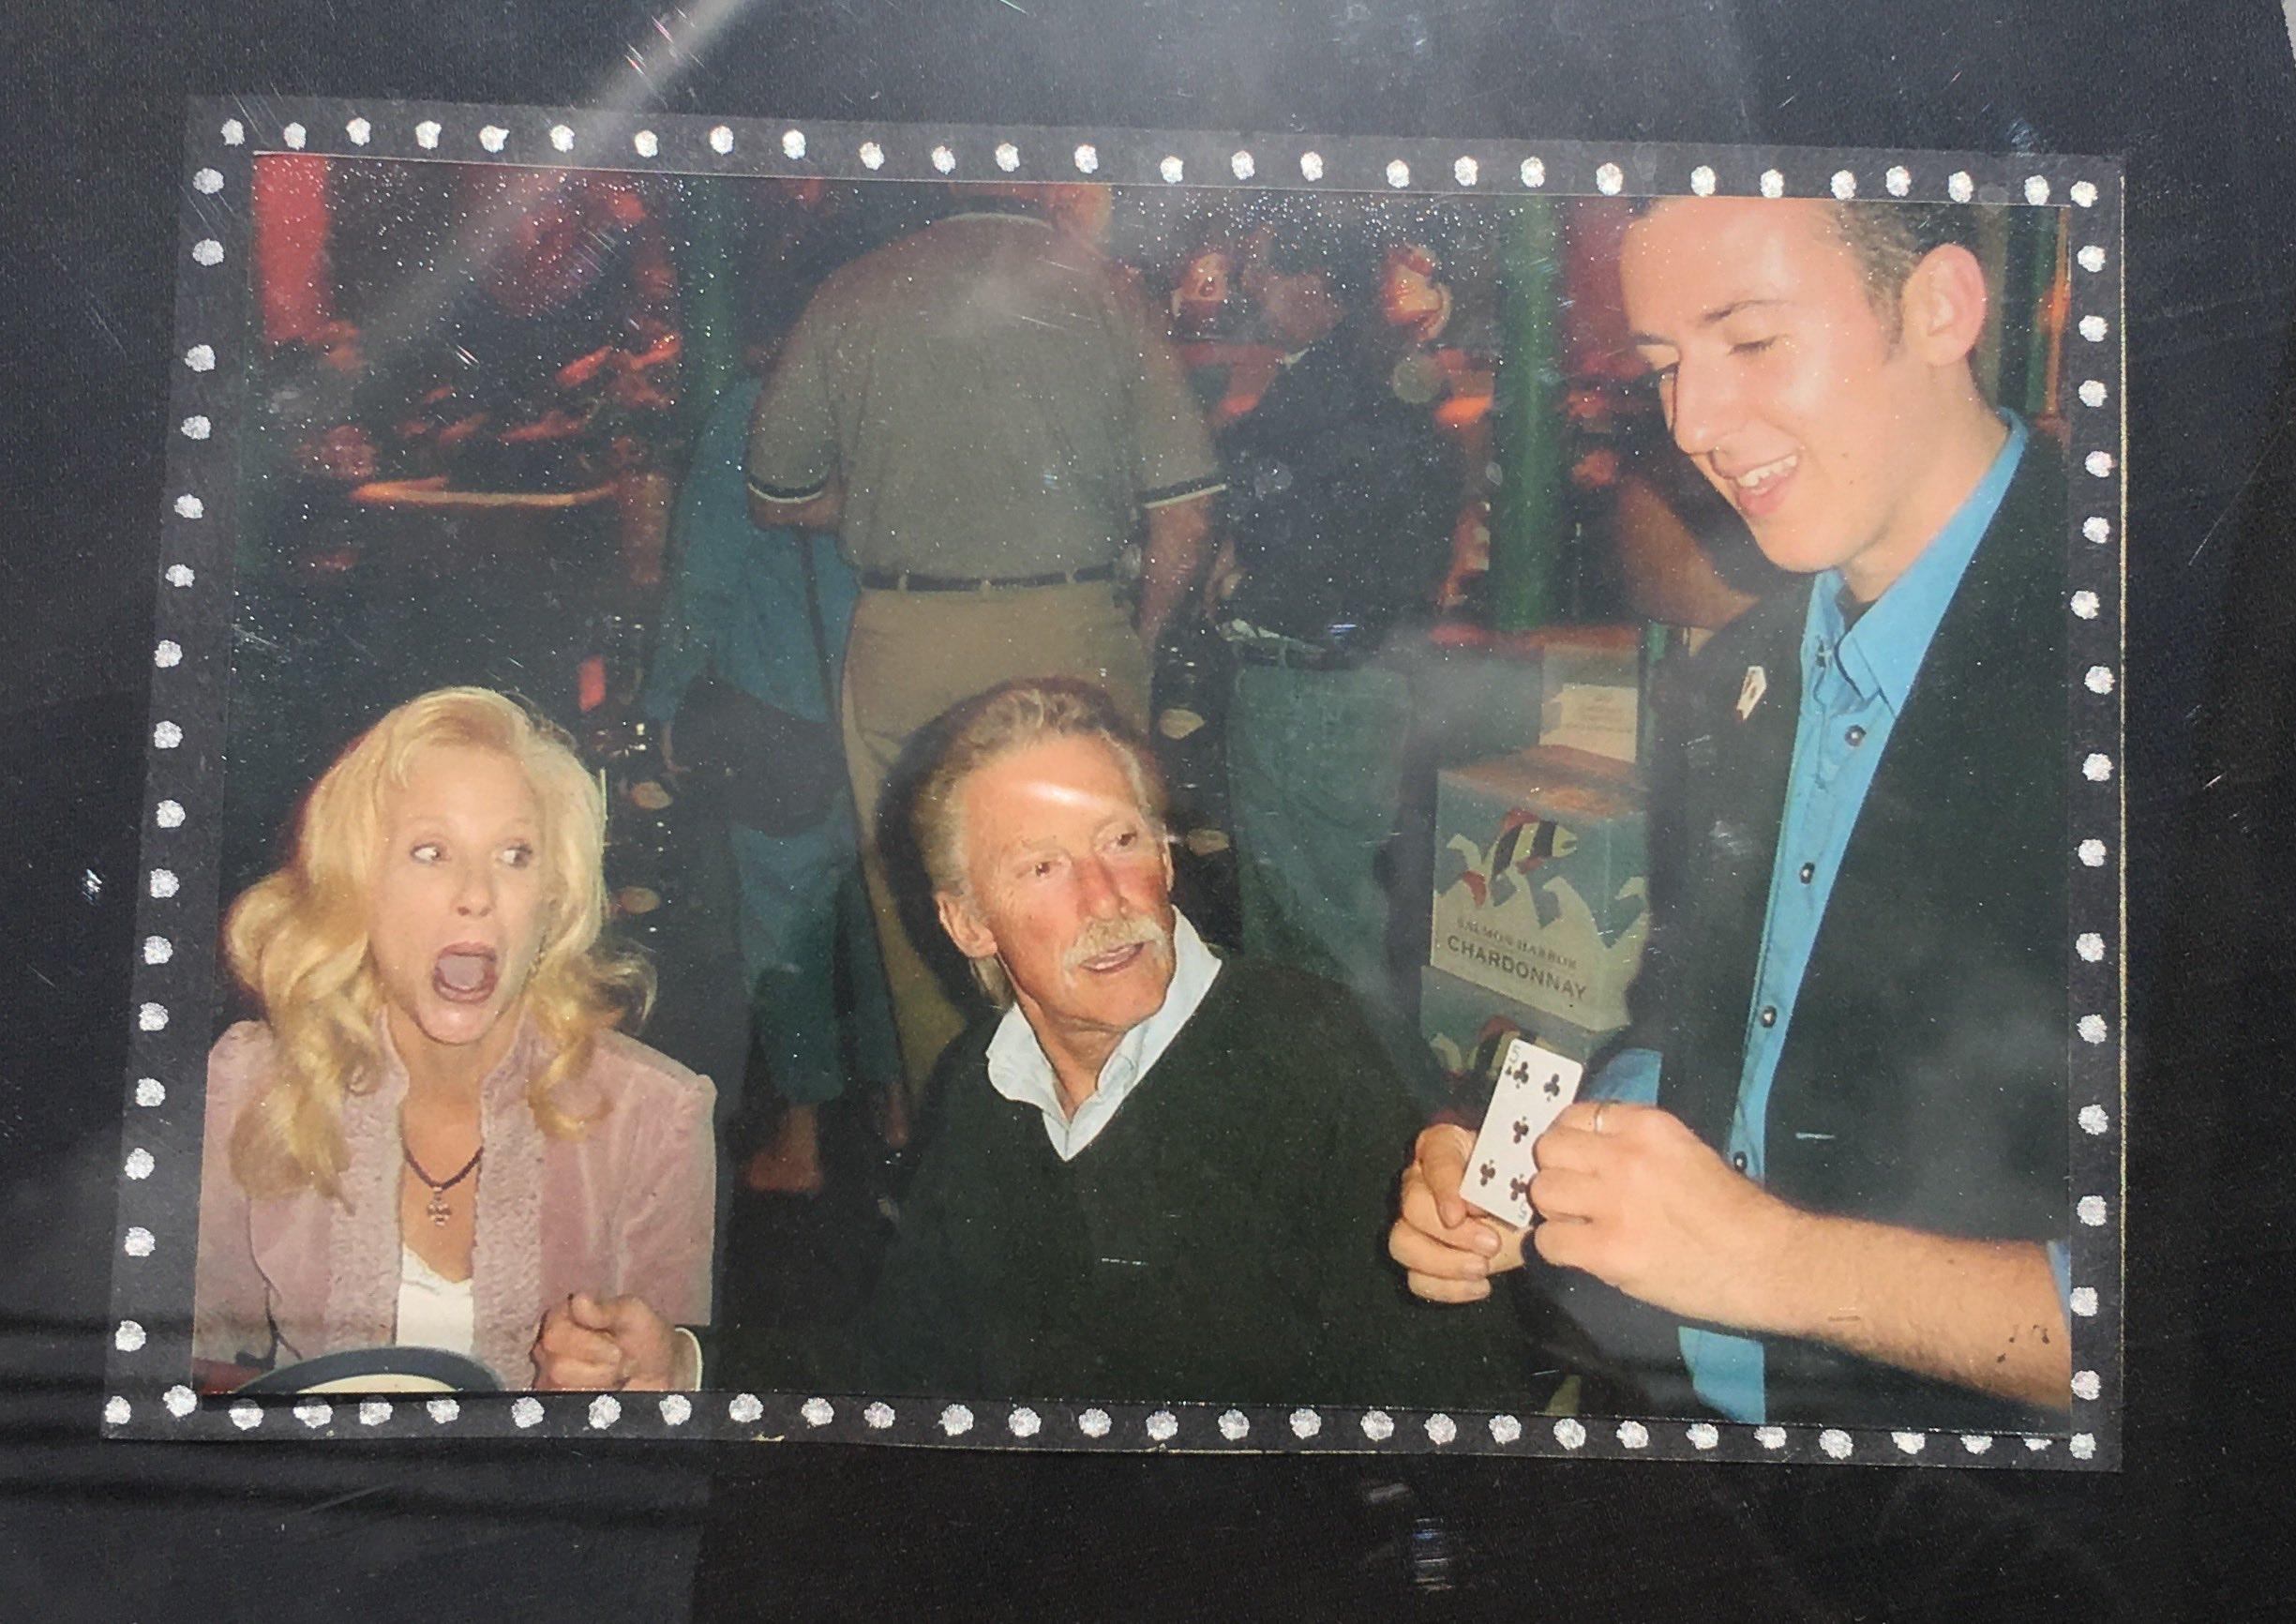 Performing magic at restaurant, age 19